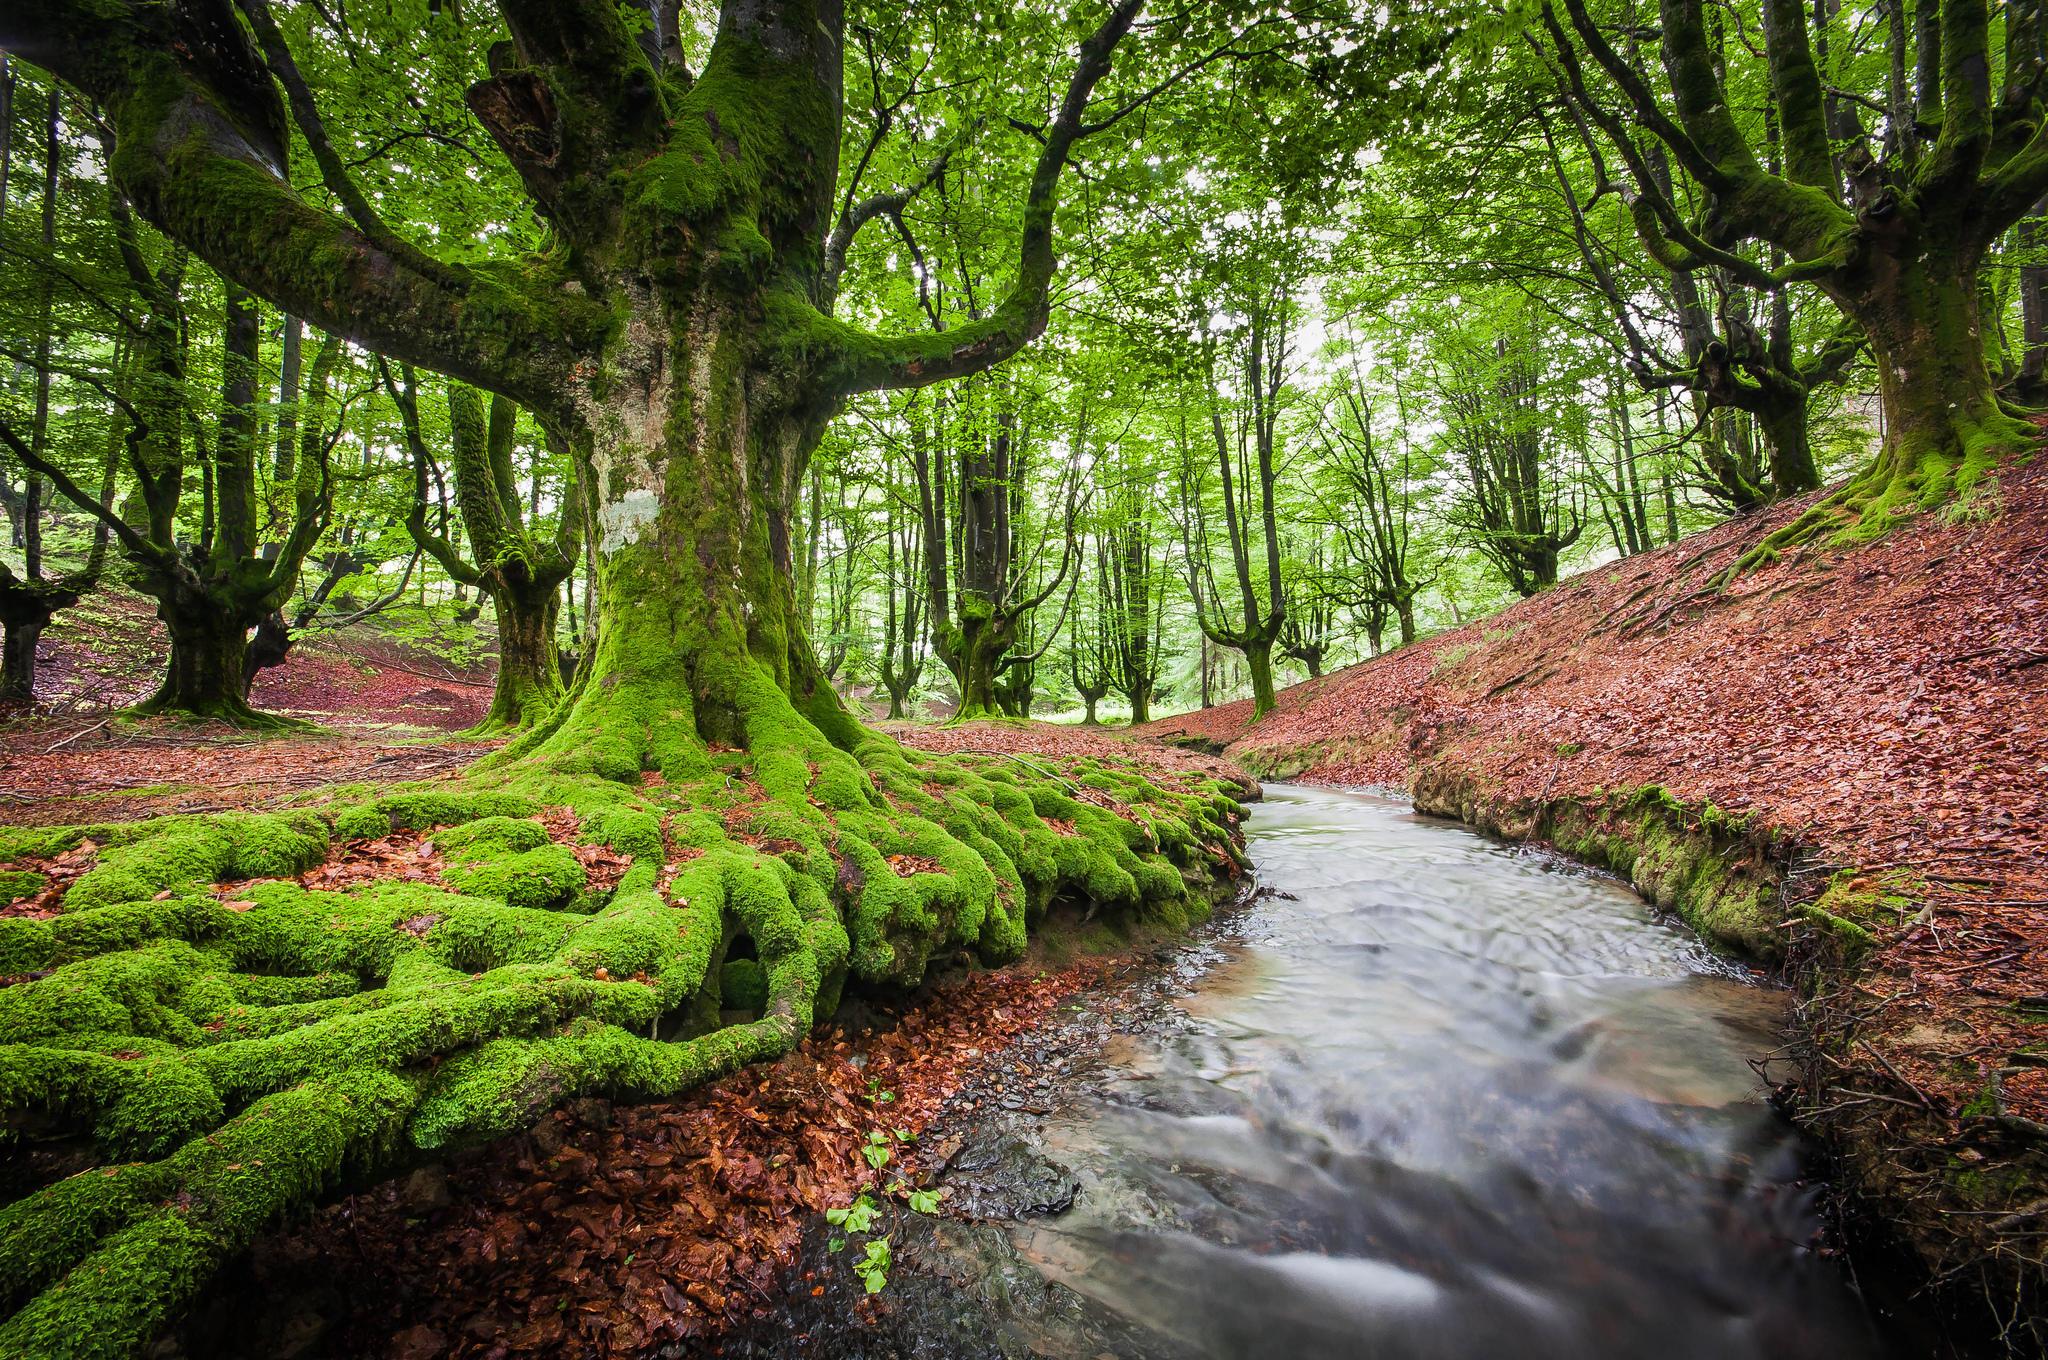 Trees in spain photos